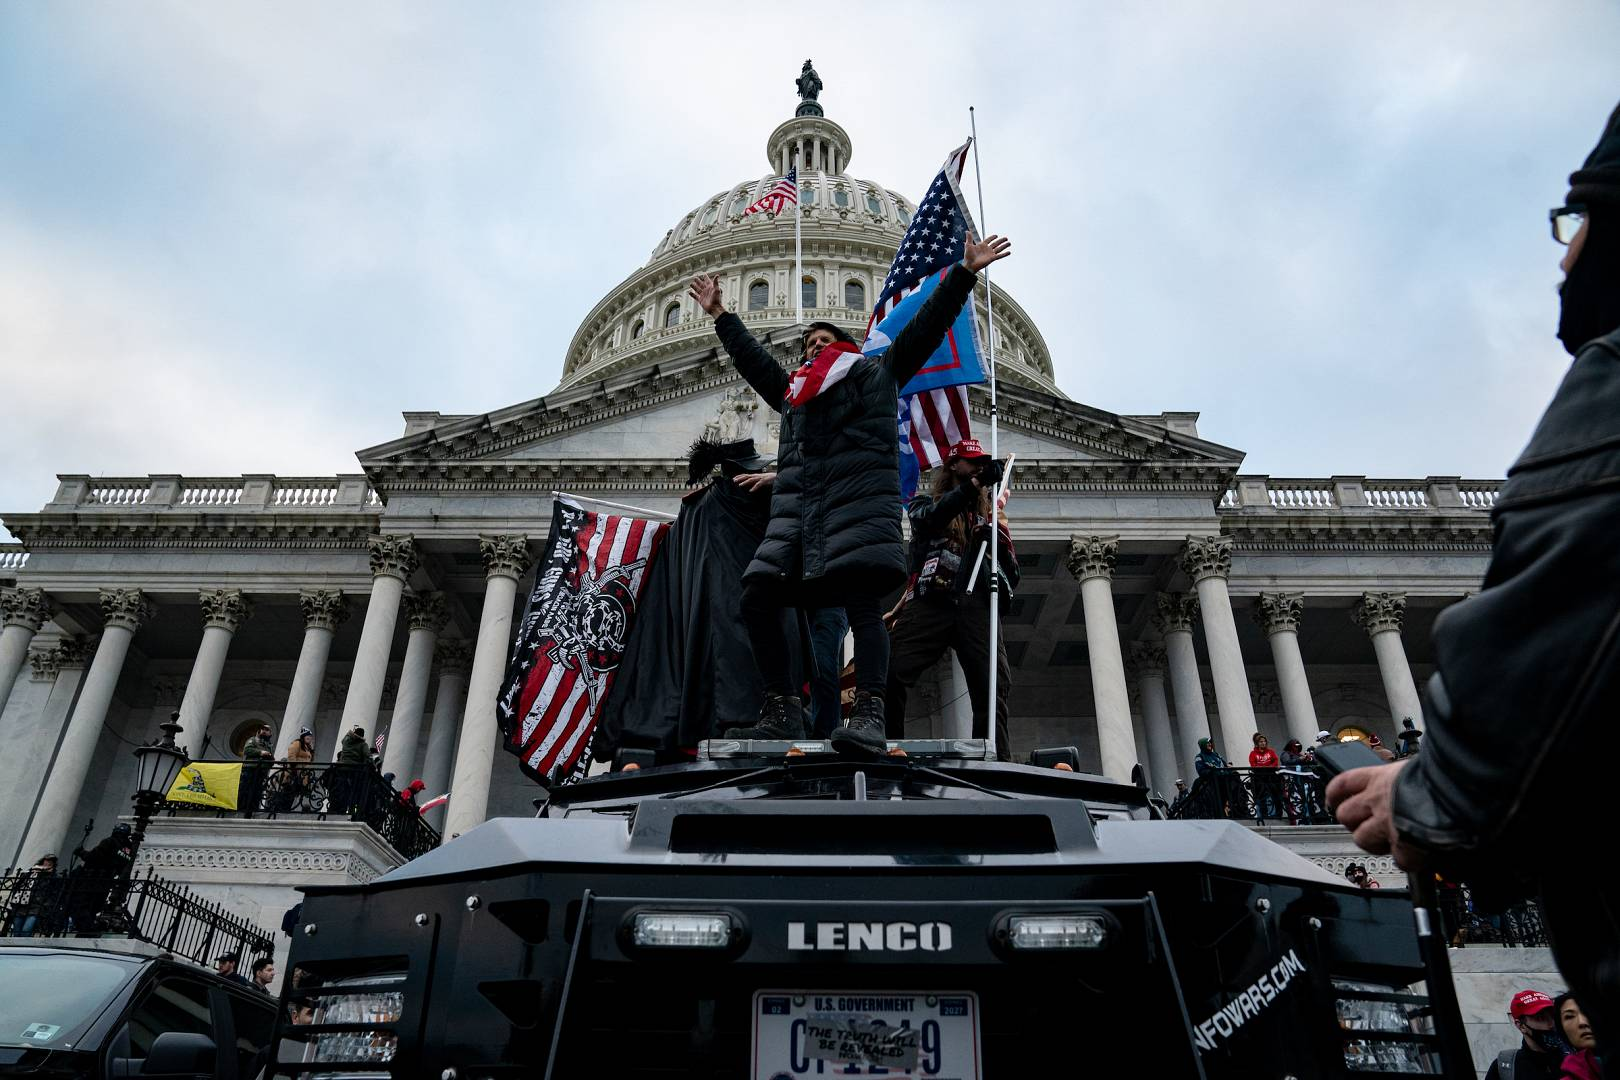 Pendukung Presiden AS Donald Trump melakukan protes di luar Gedung Kongres AS di Washington, AS. 6 Januari 2021